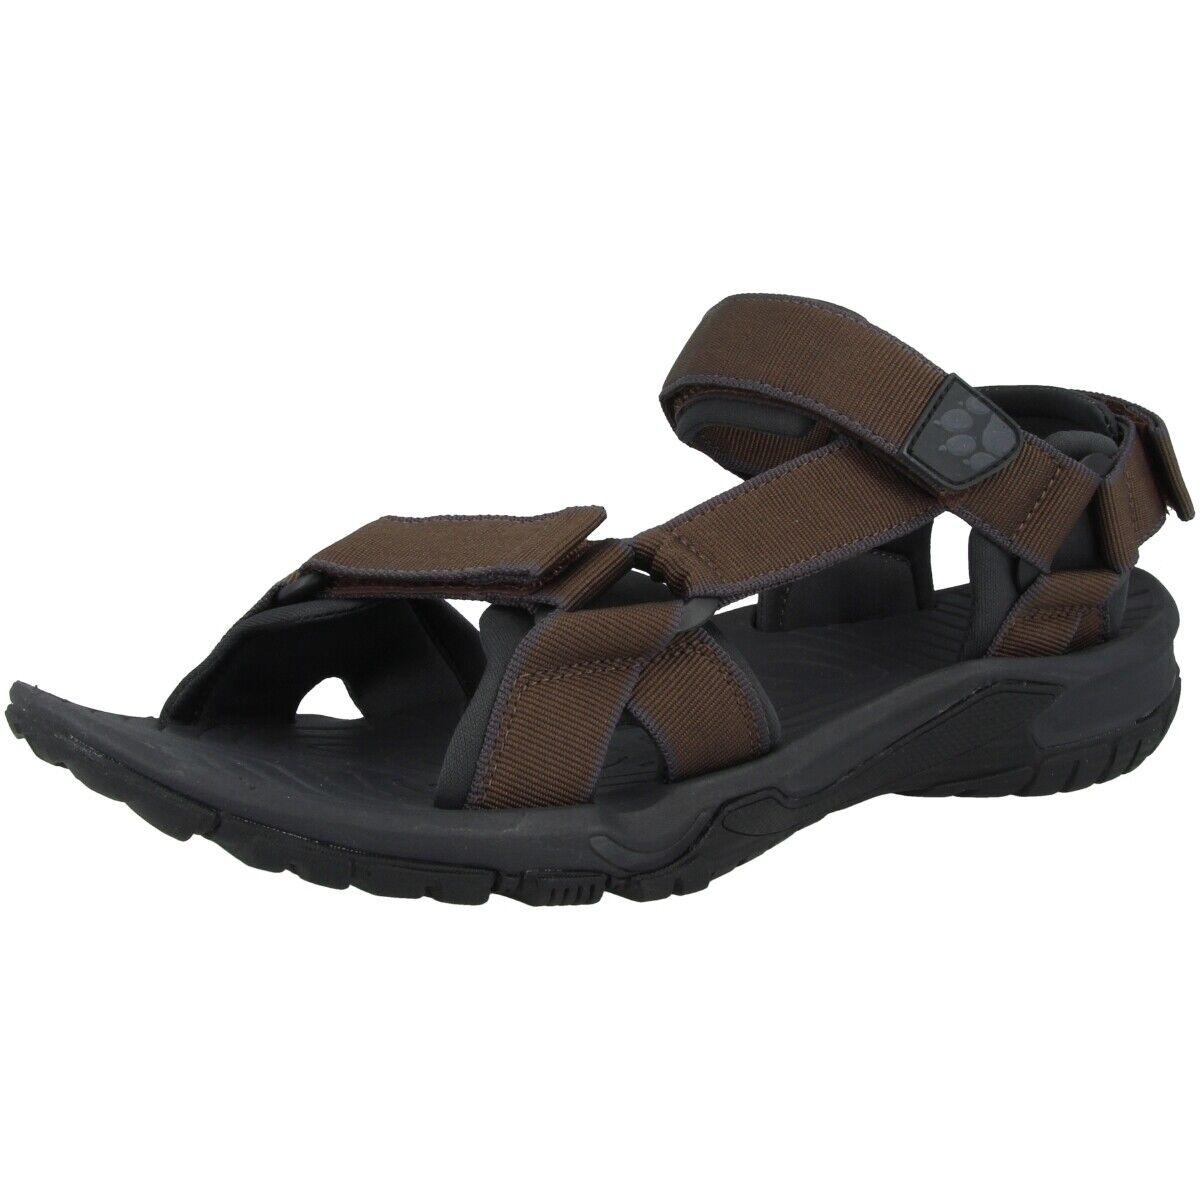 Jack Wolfskin Lakewood Ride Sandal Men señores outdoor sandalias teca 4019021-5607